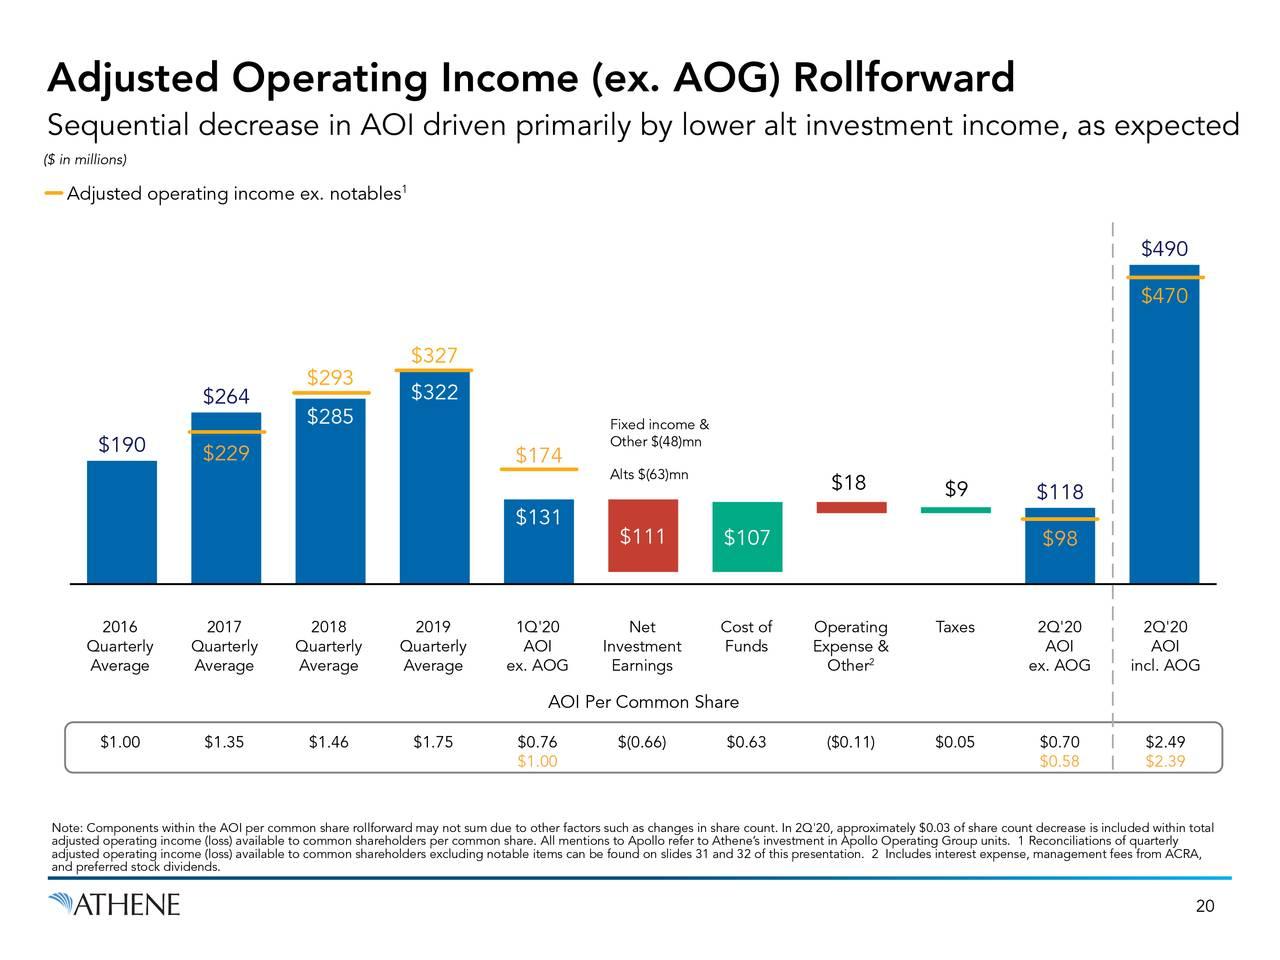 Ingreso operativo ajustado (ex. AOG) Rollforward